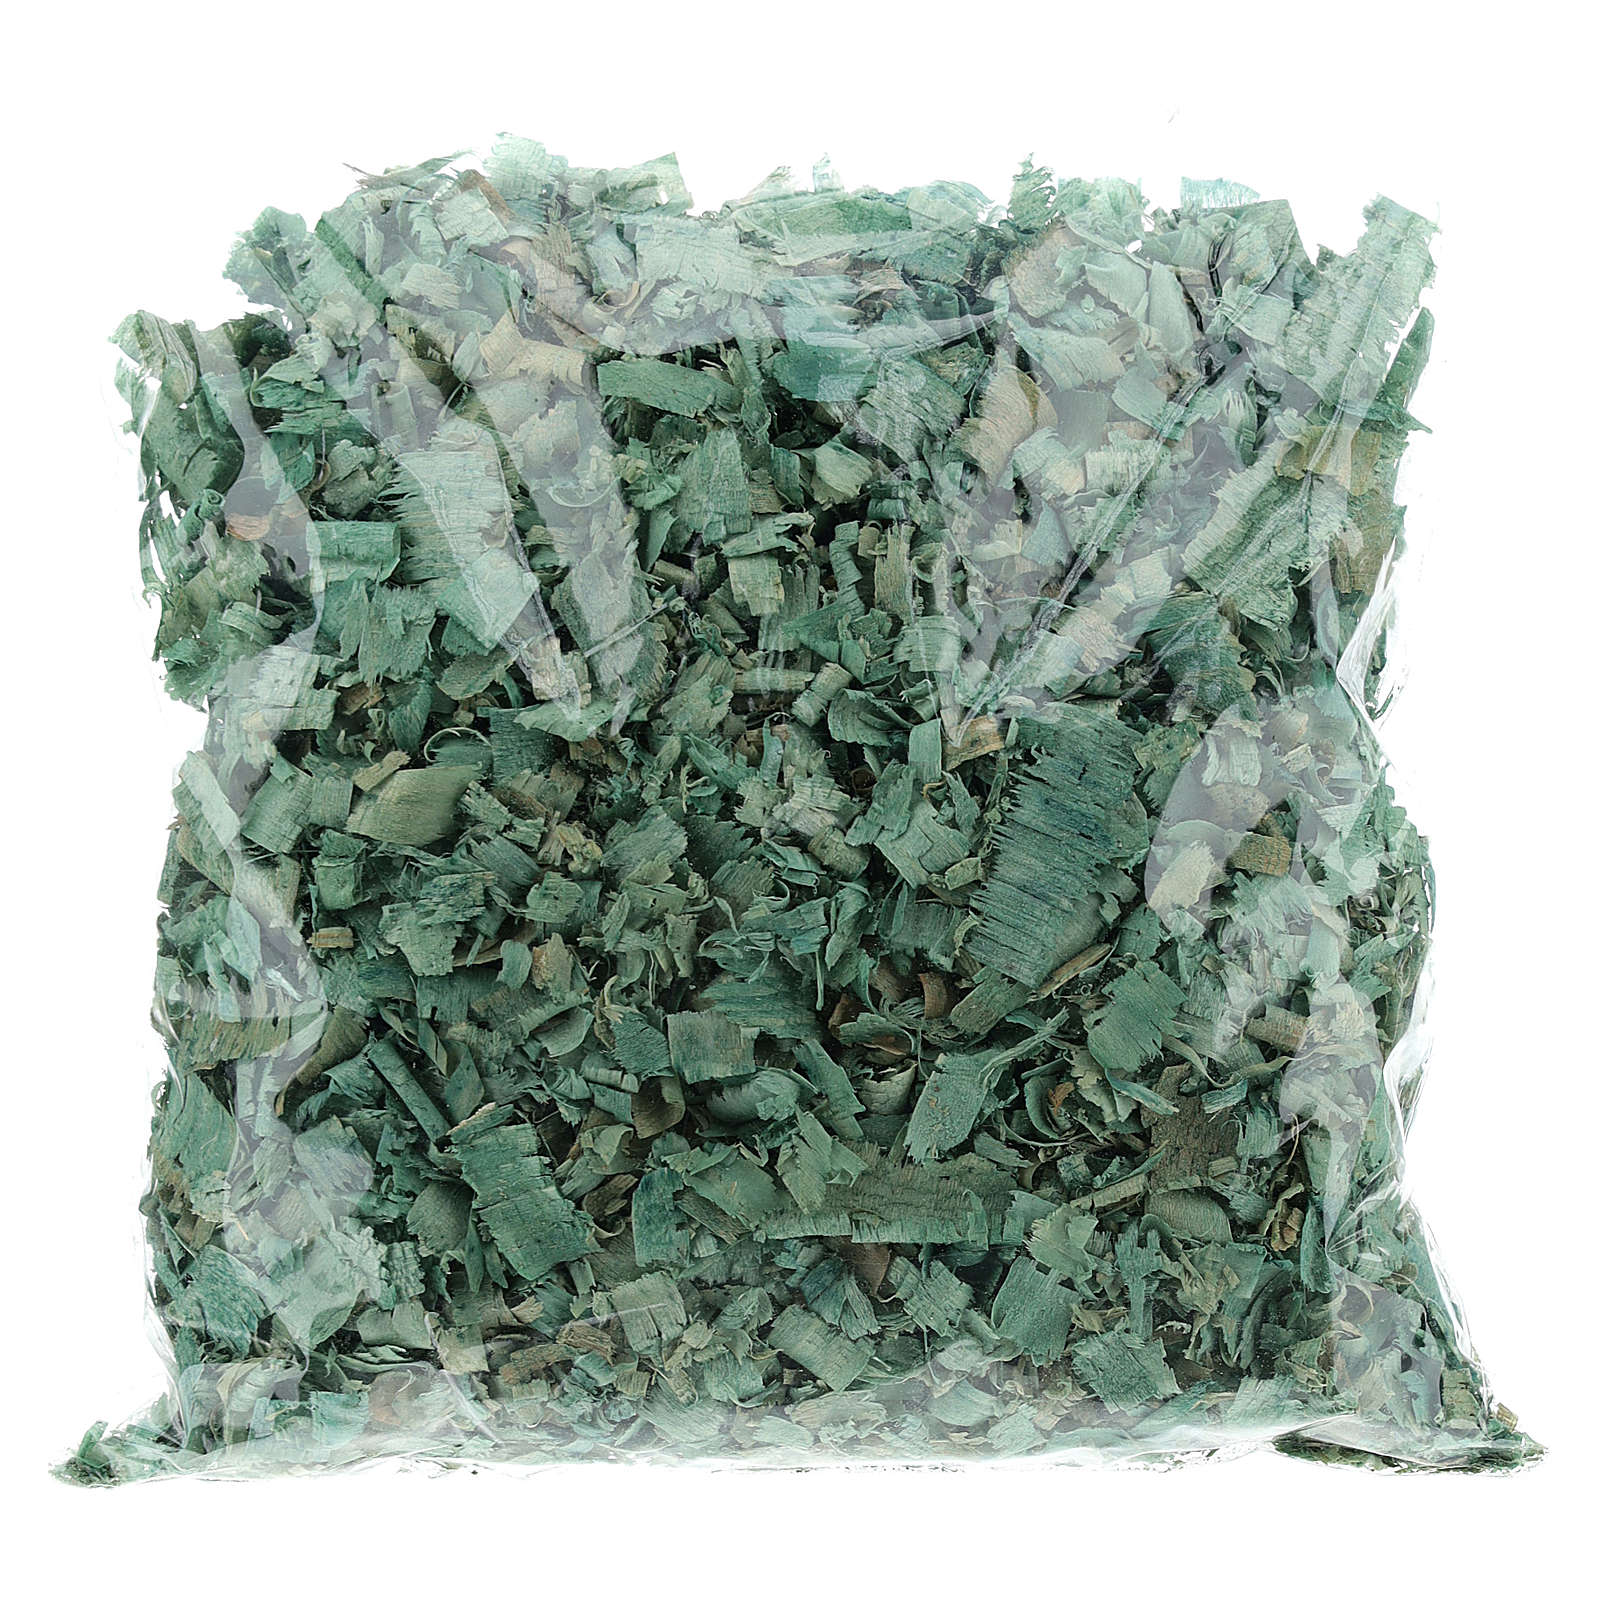 Virutas verde 100 gr para pisos belén 4